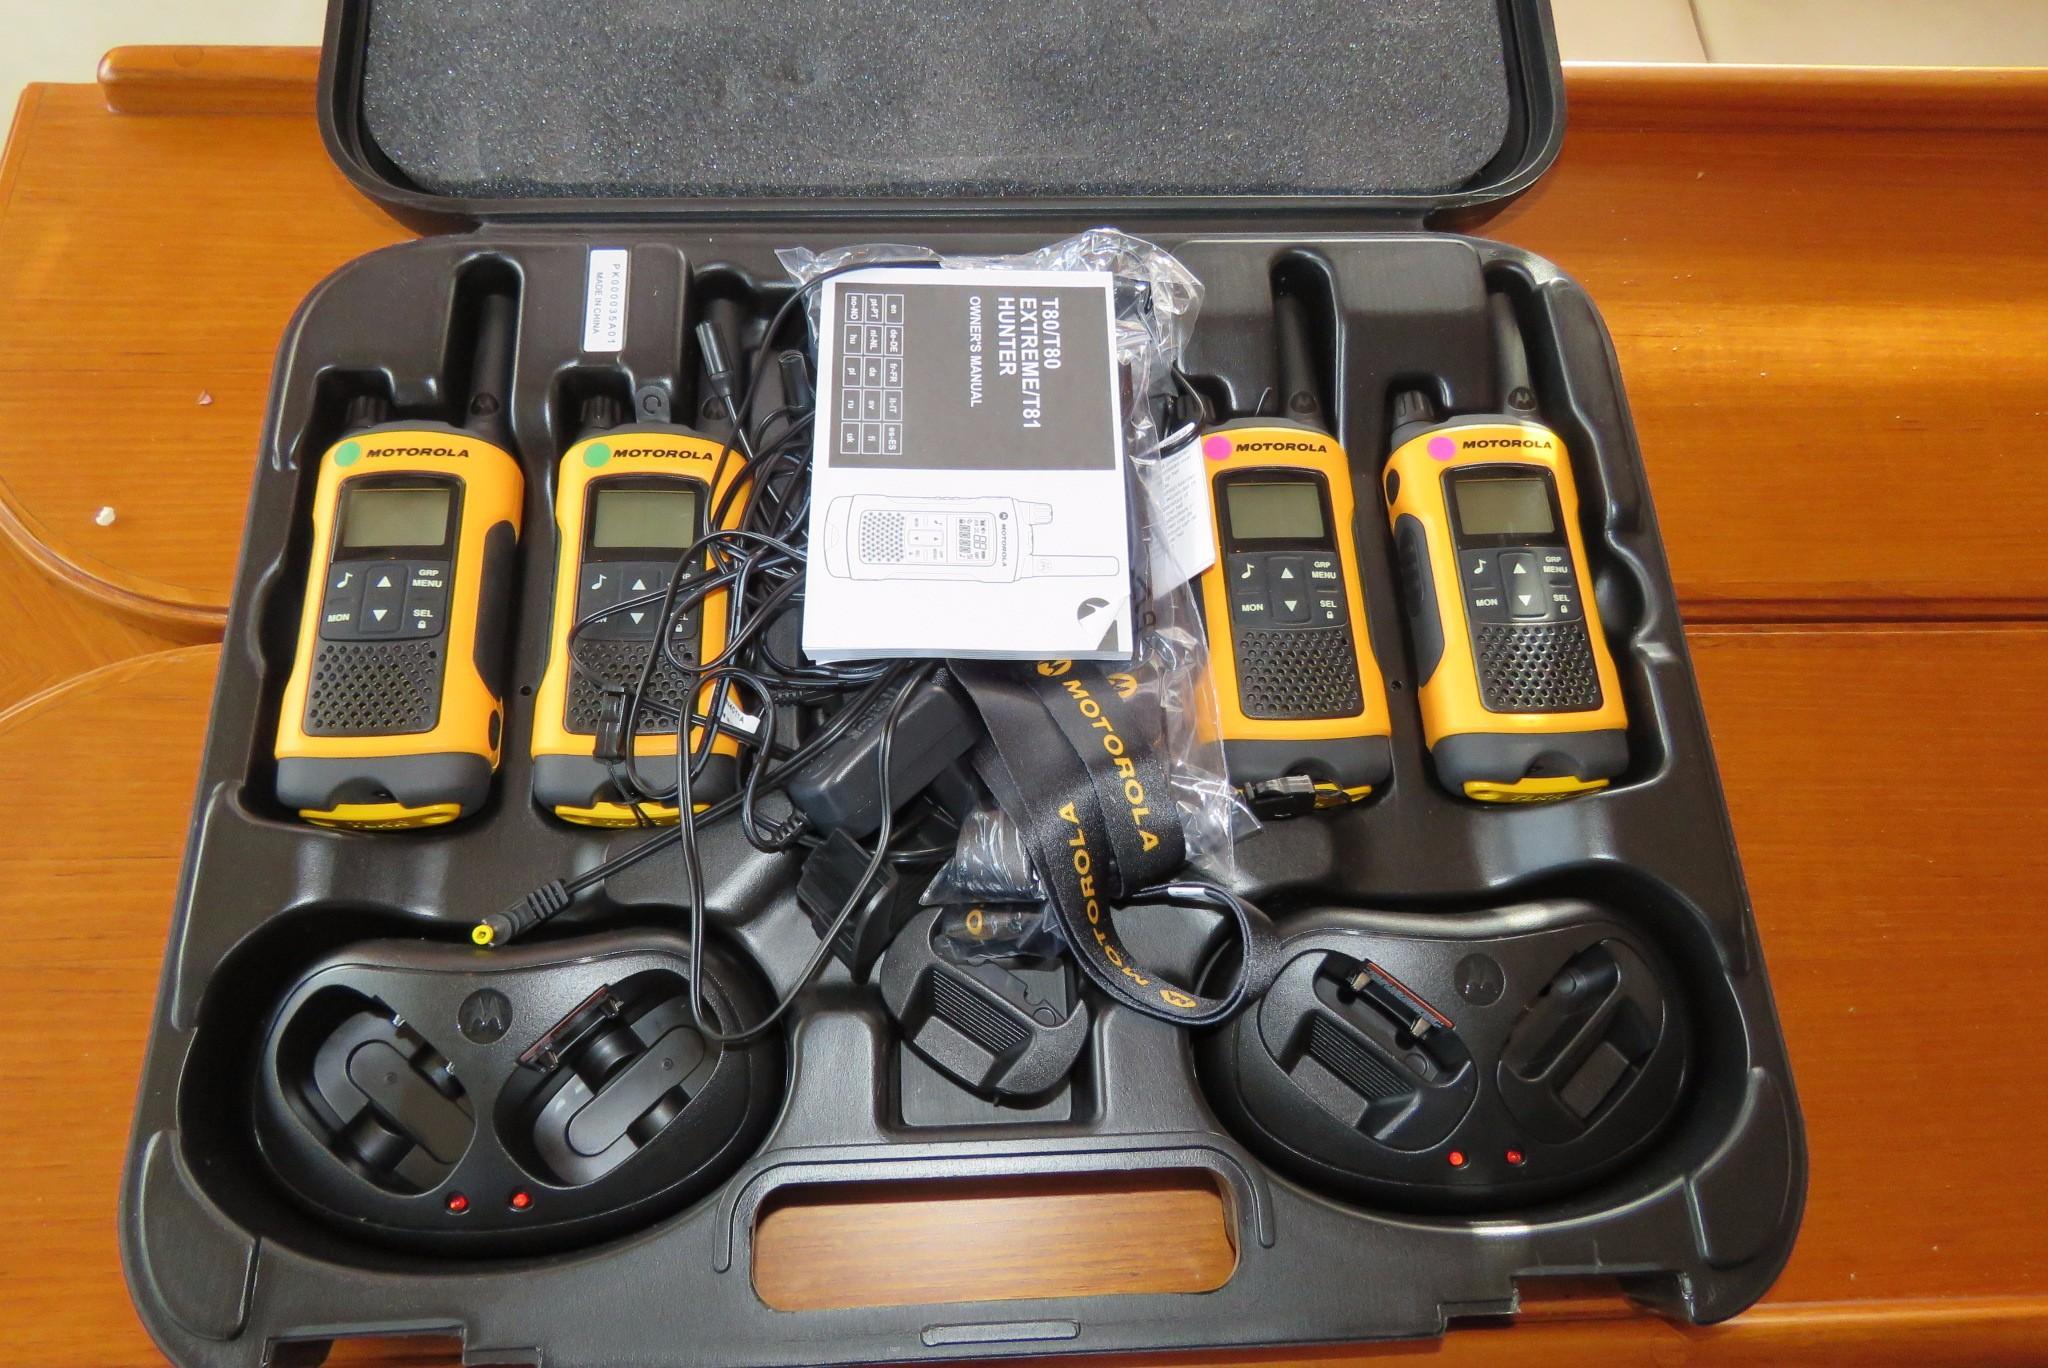 59 Grand Banks Portable VHF